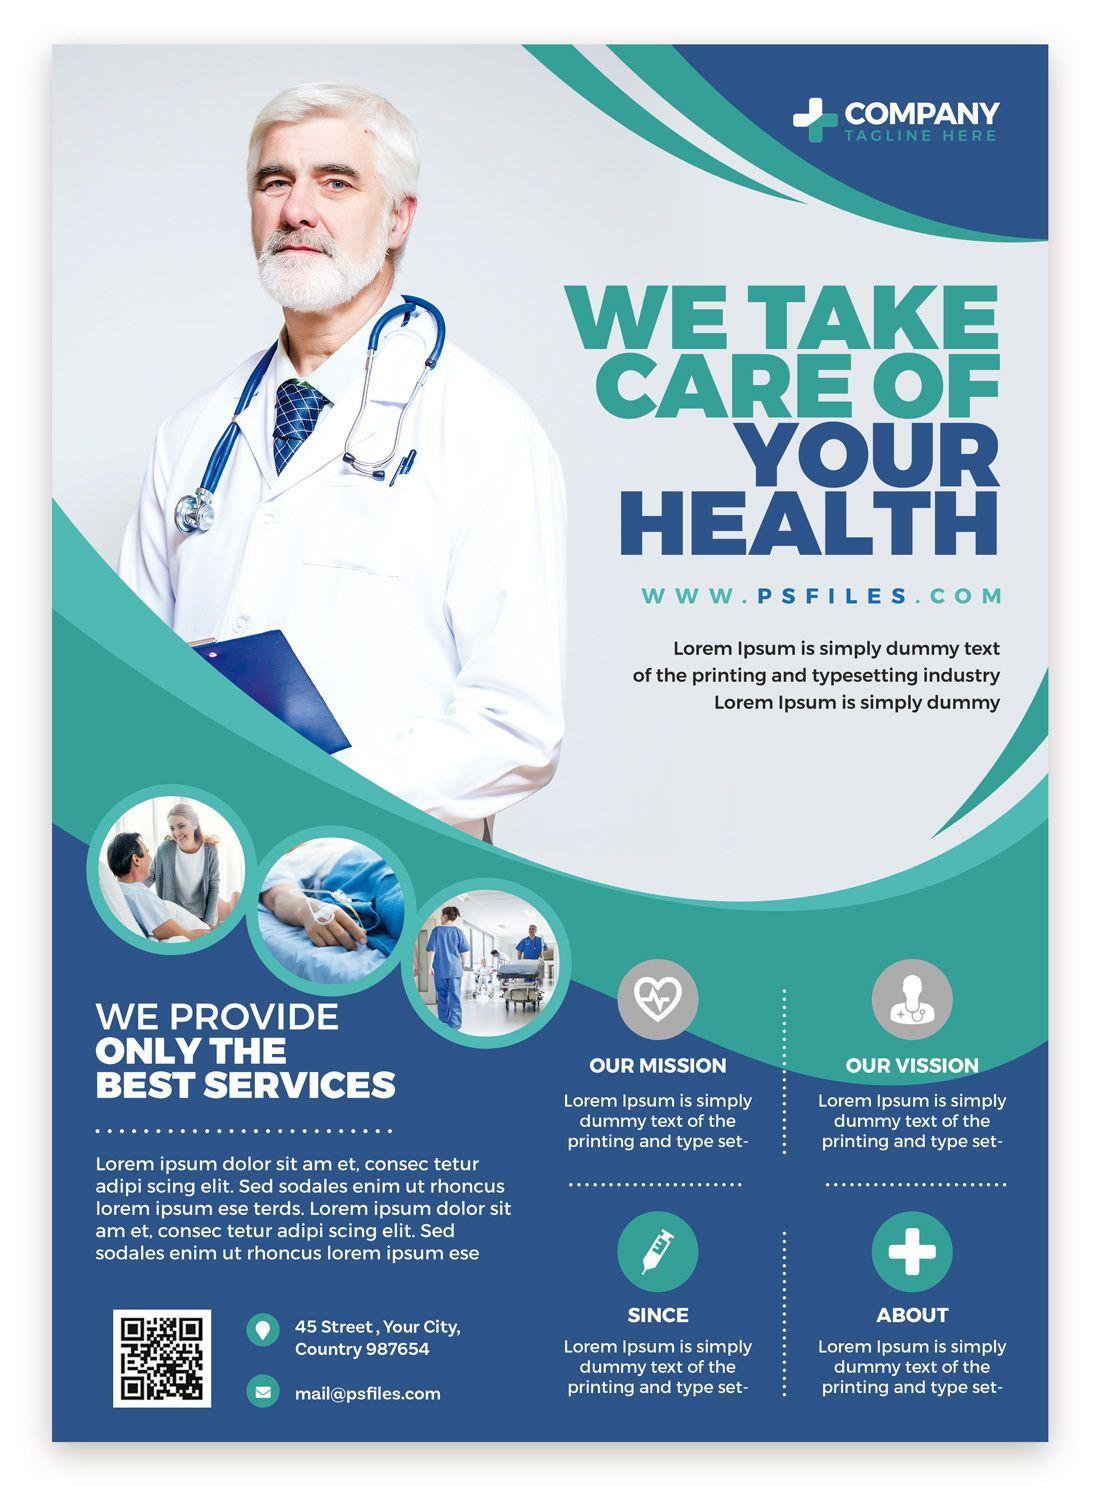 Hospital Health Care Free Psd Flyer Template Medical Posters Hospital Health Free Psd Flyer Templates